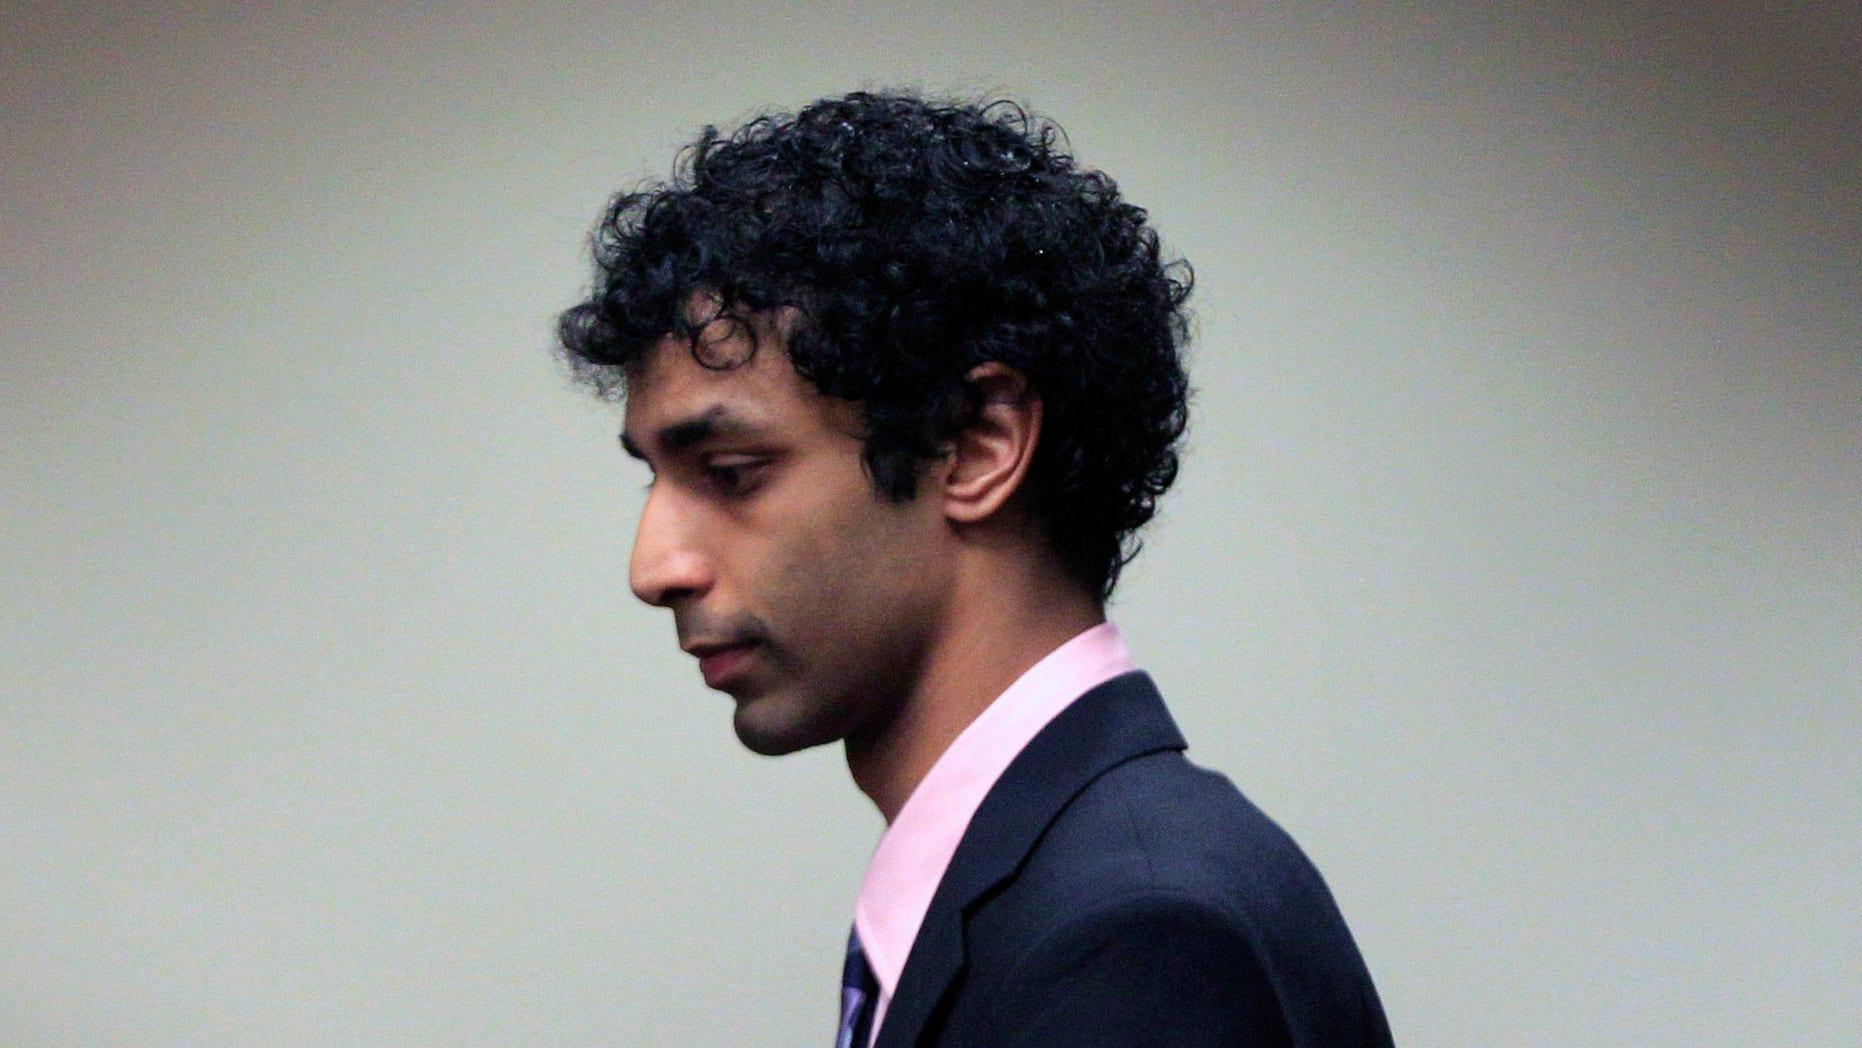 Dharun Ravi arrives at court for his sentencing hearing in New Brunswick, N.J.